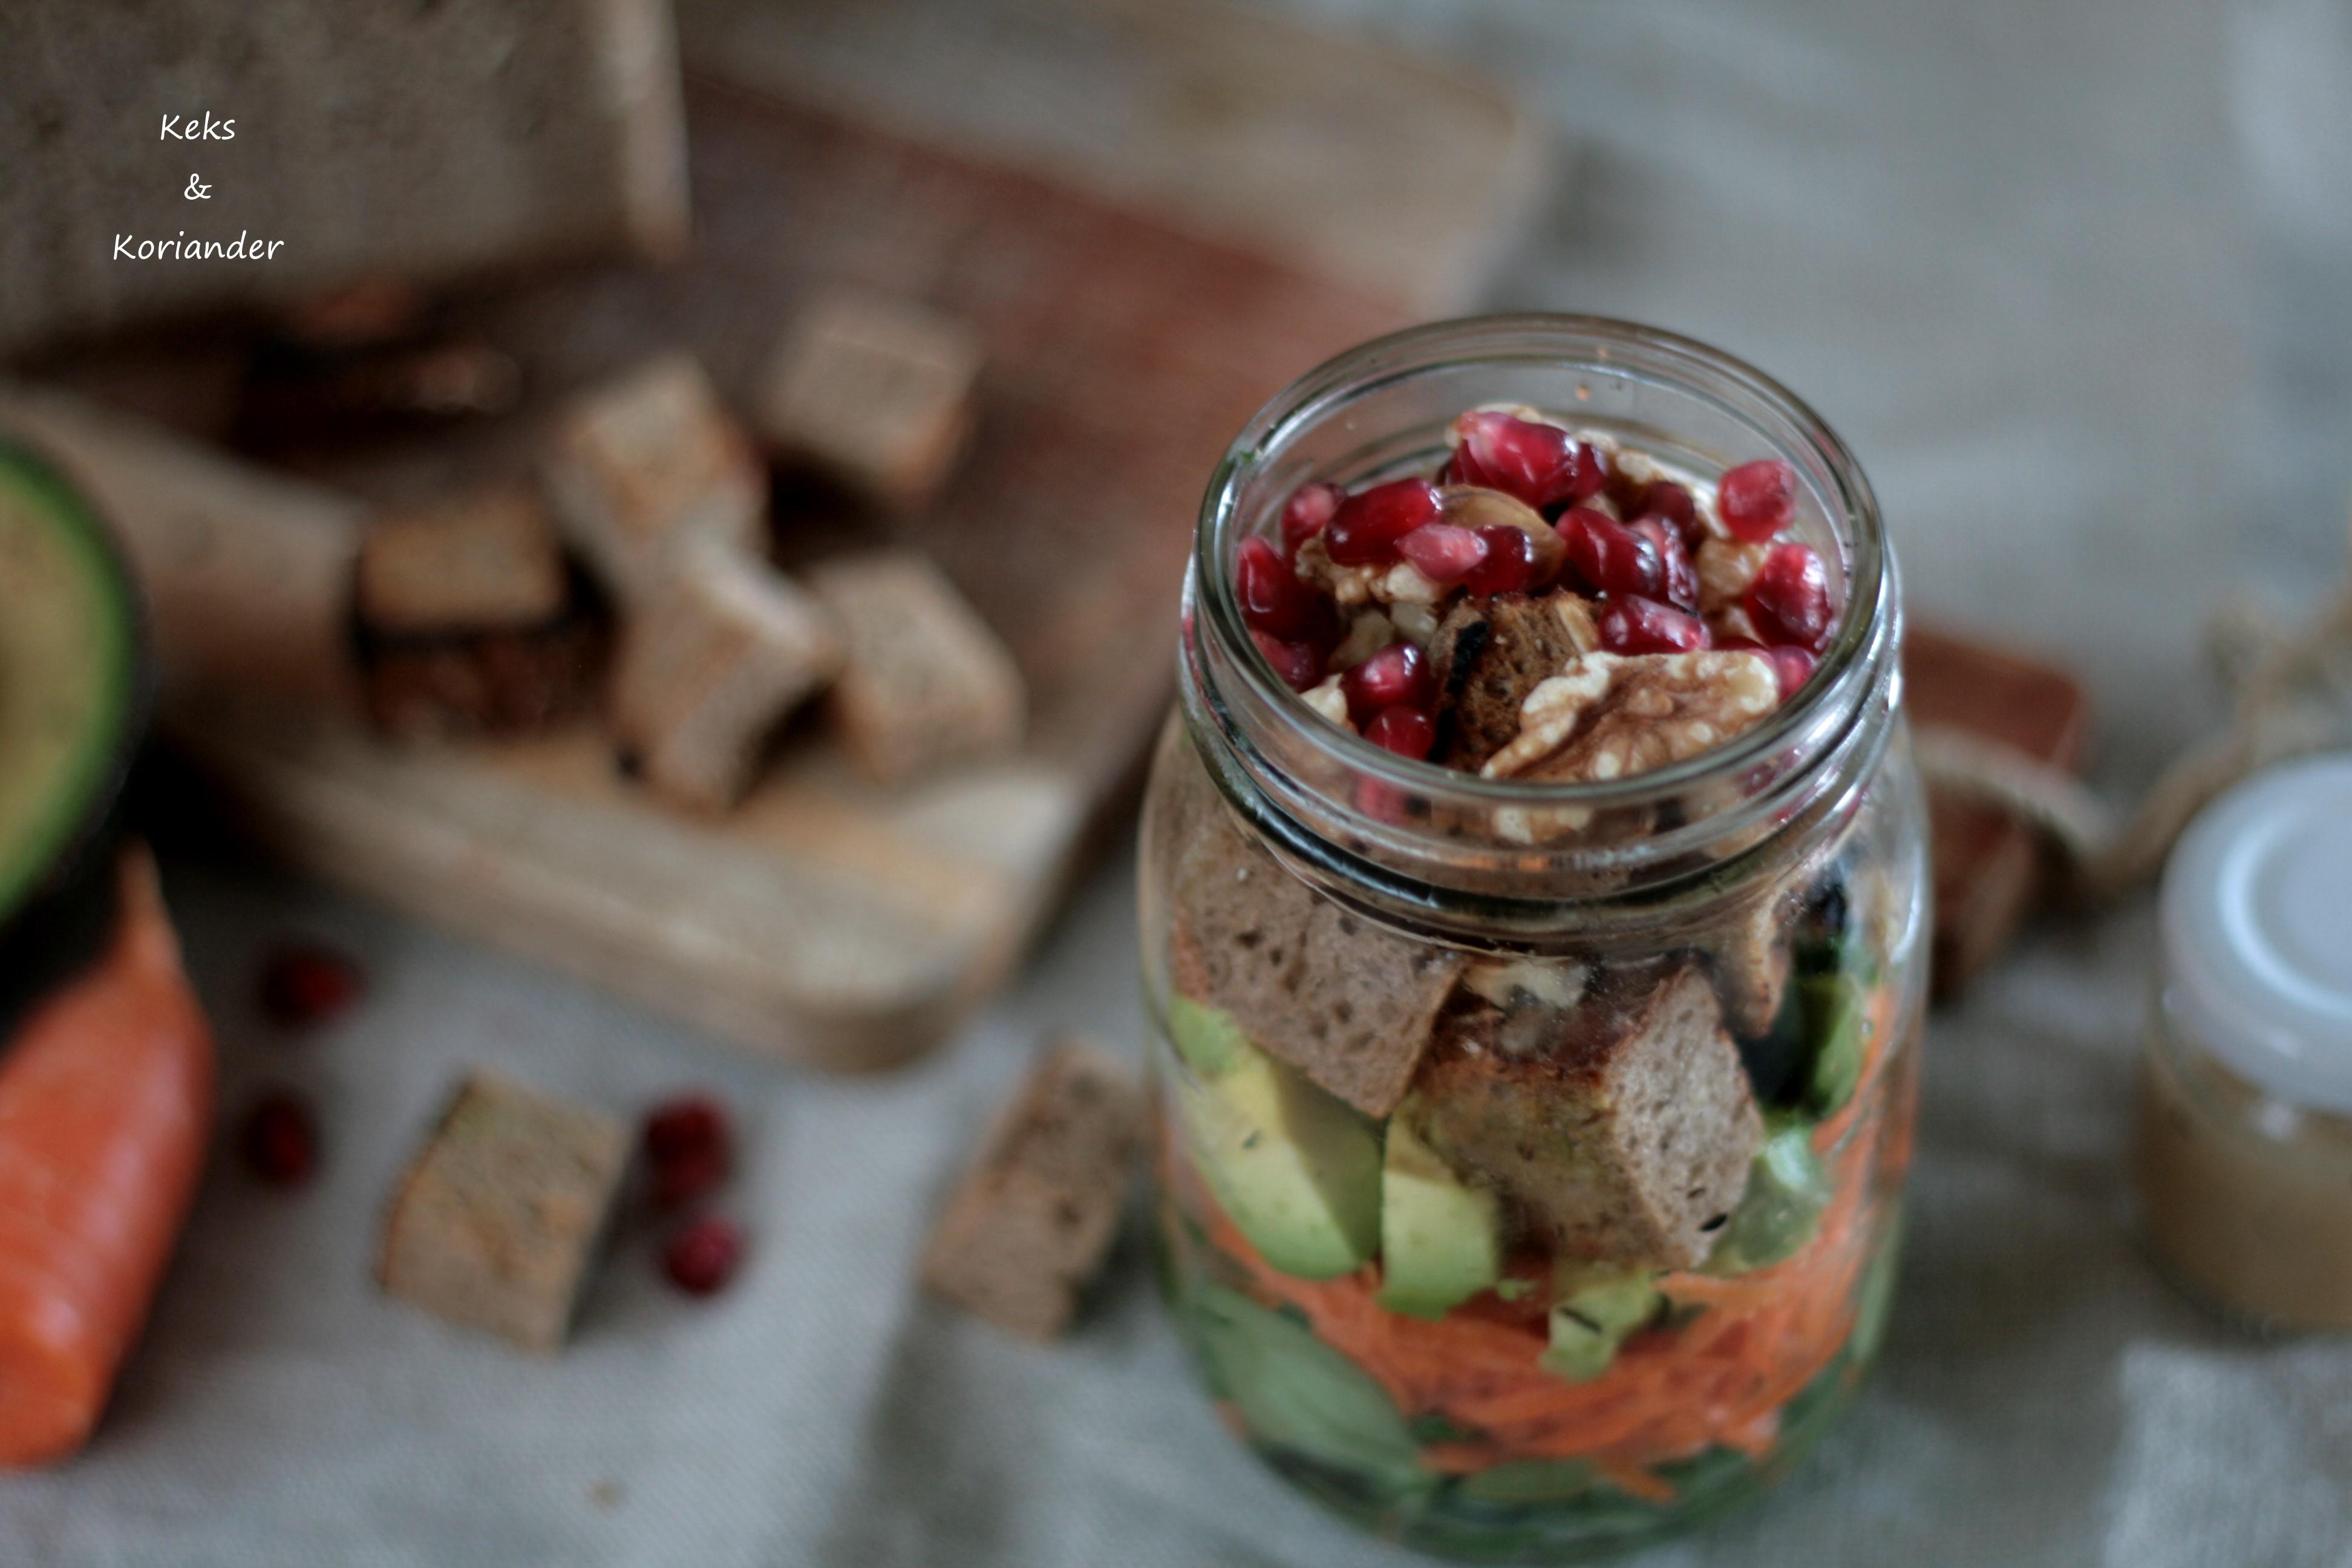 Brotsalat zum Mitnehmen mit Granatapfel, Avocado, Karotte, Feldsalat, Walnüssen